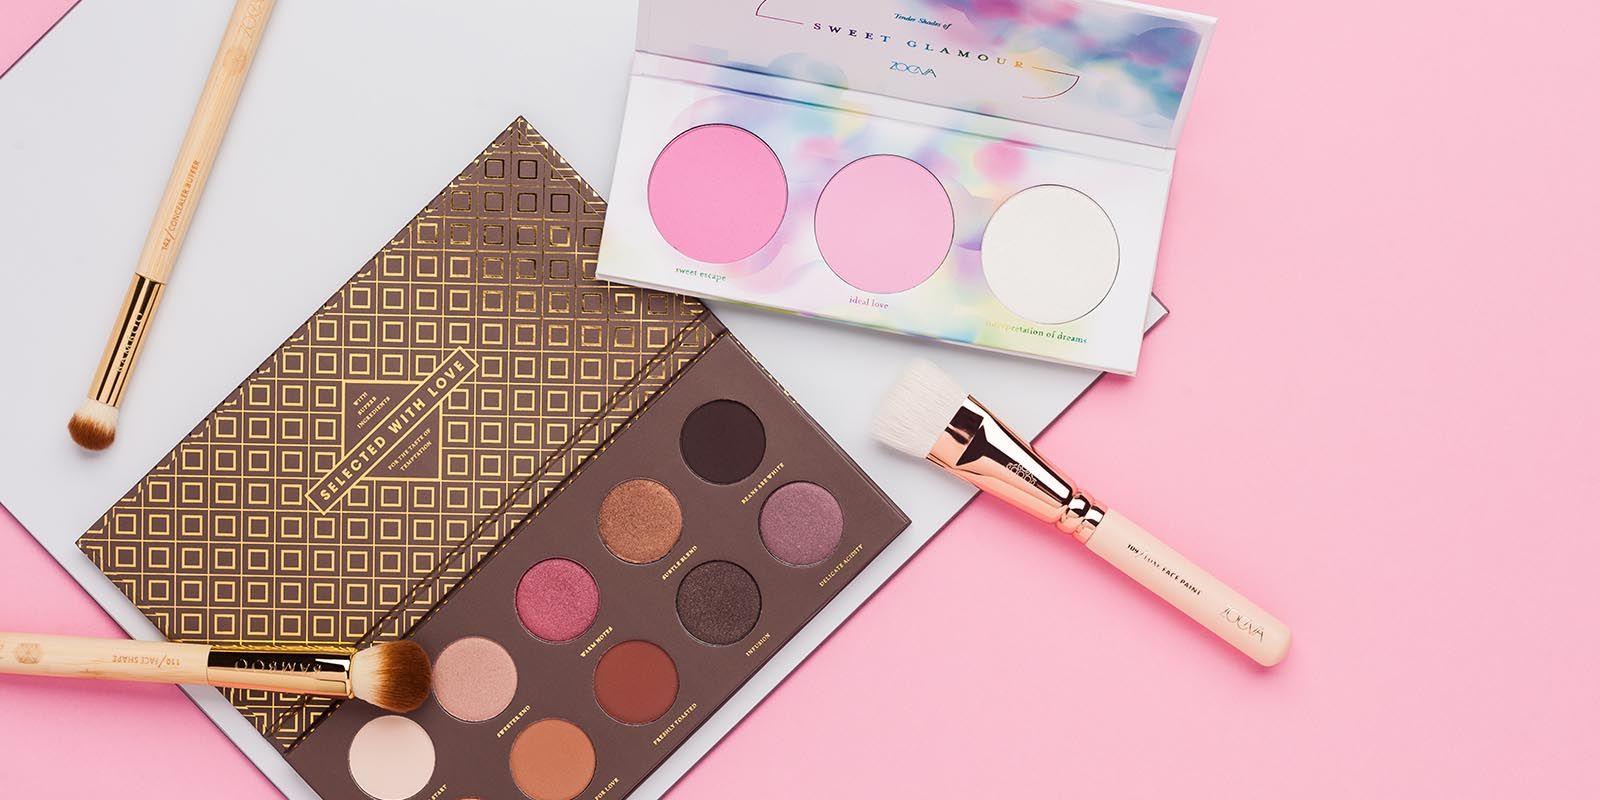 ZOEVA from Love Make Up Makeup artist kit essentials